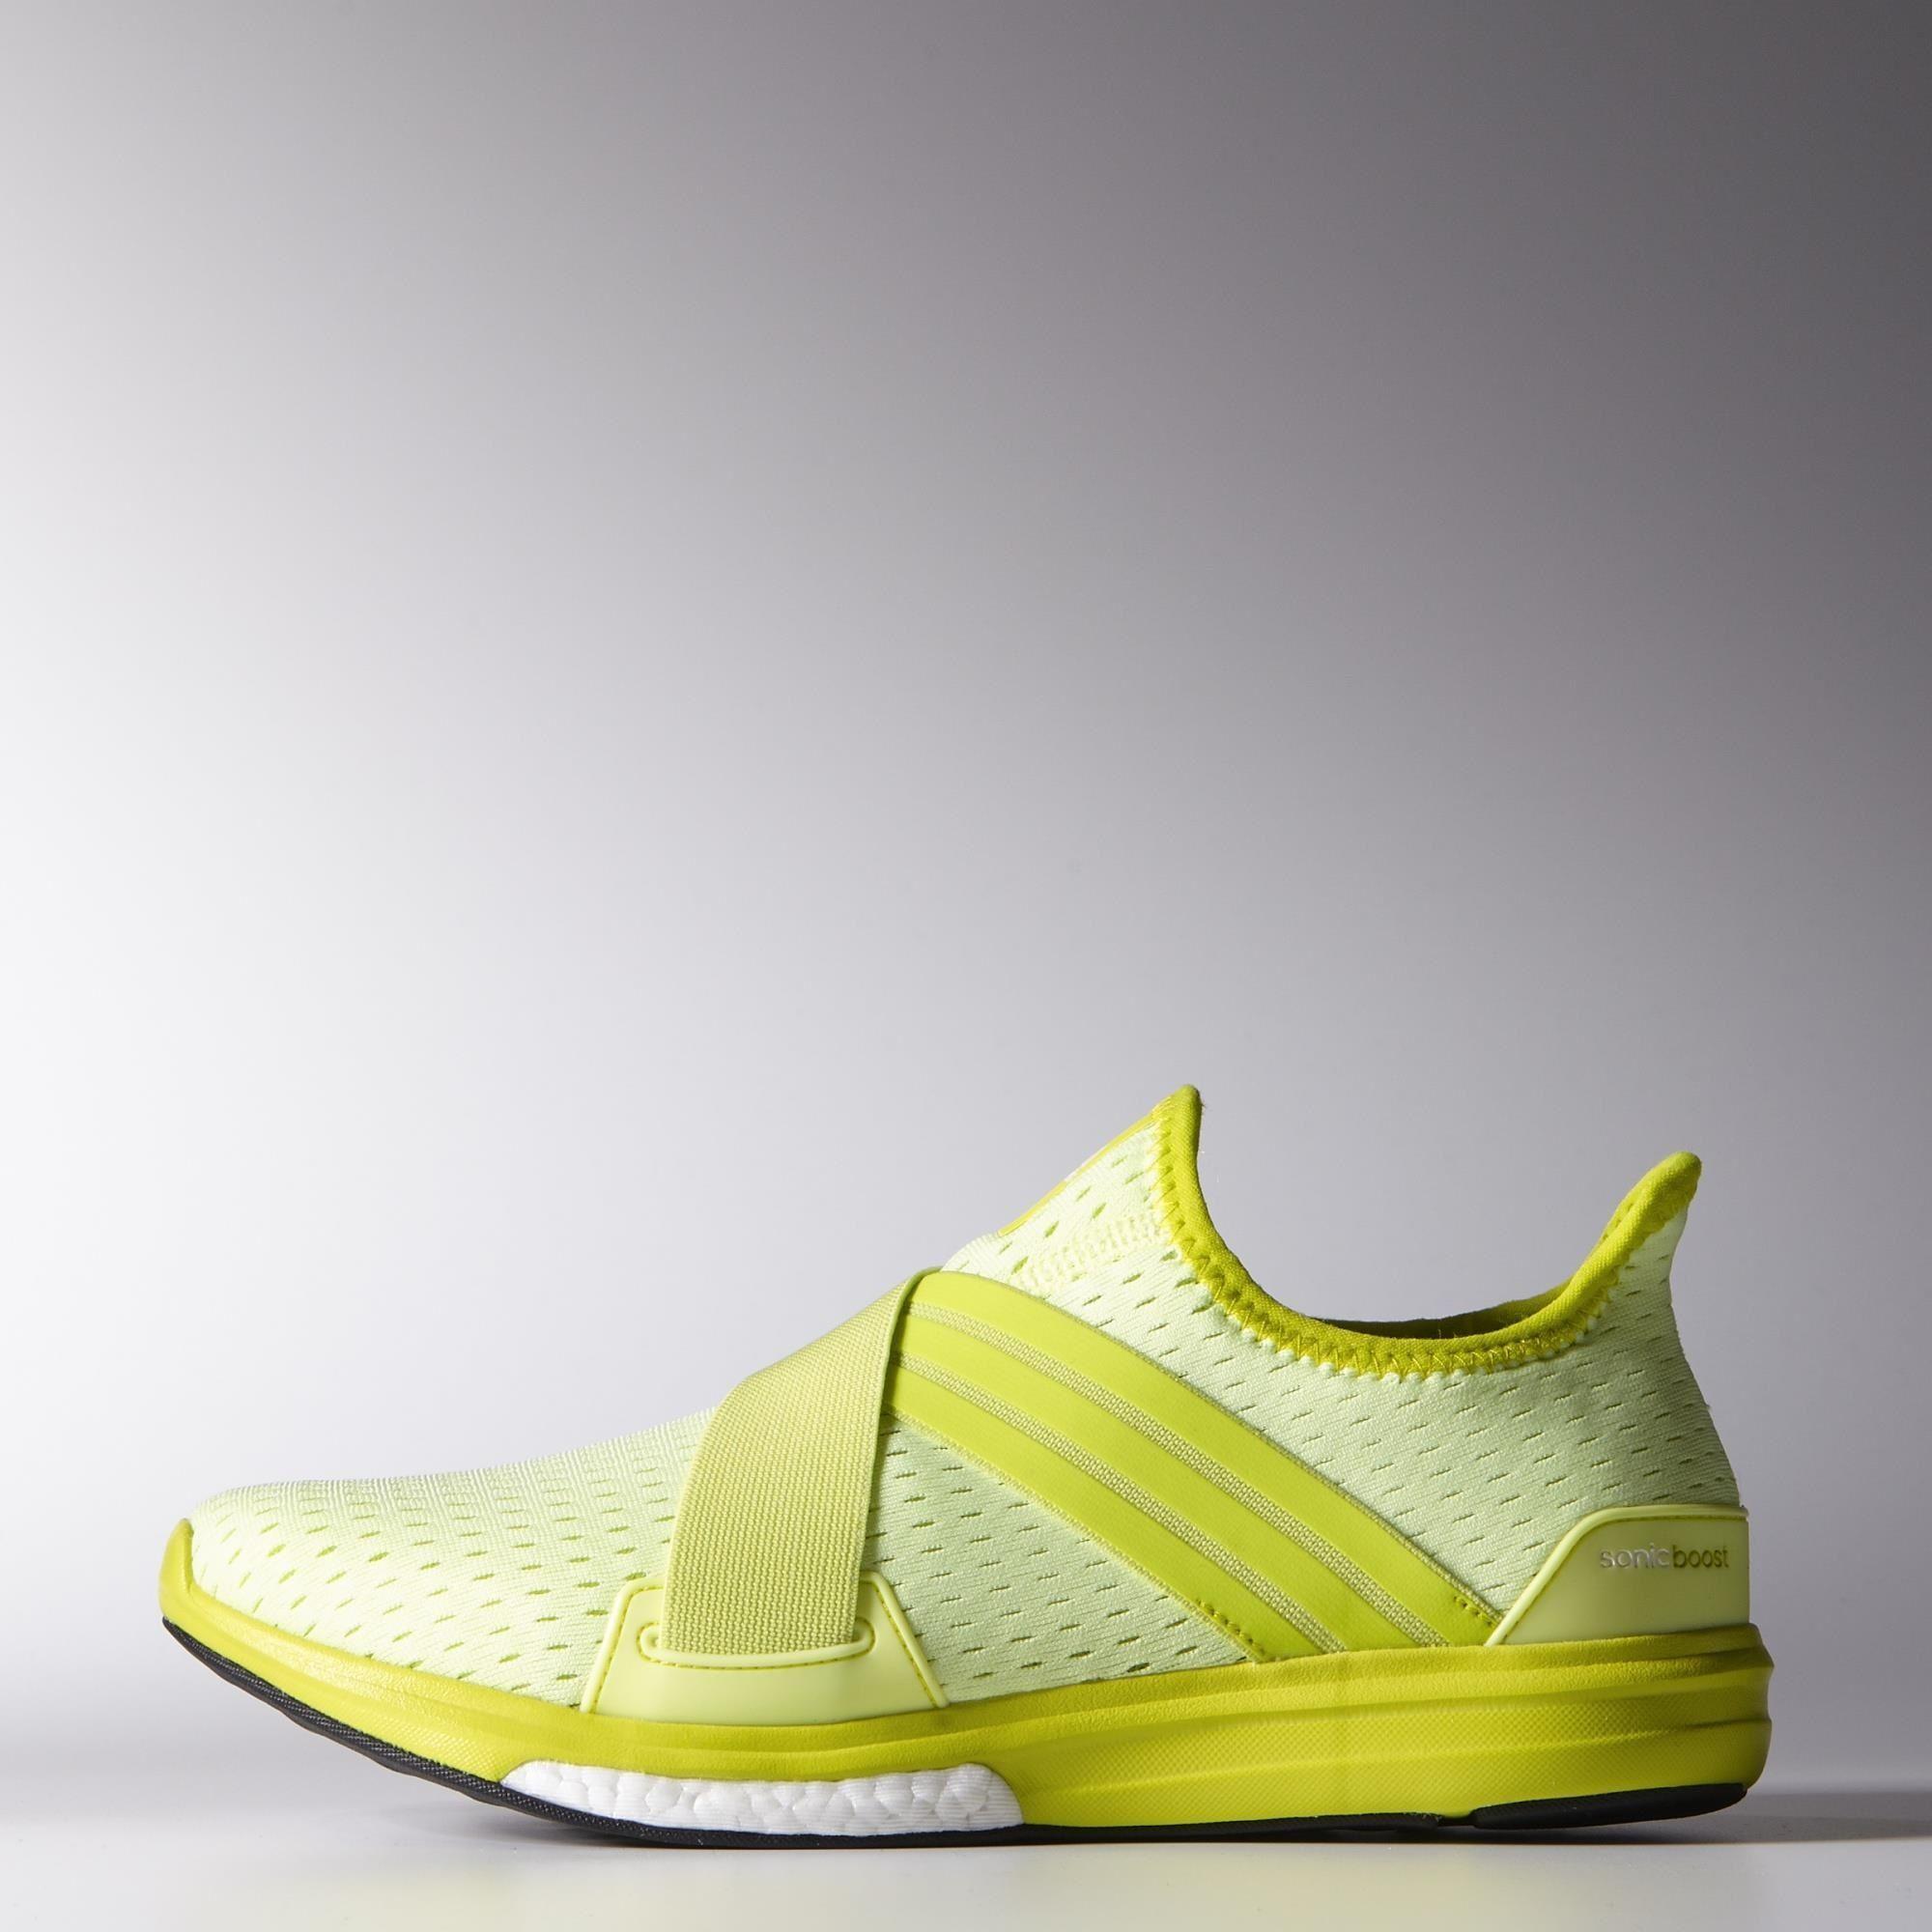 brand new a849e a85a3 adidas - Climachill Sonic Boost AL GFX Shoes